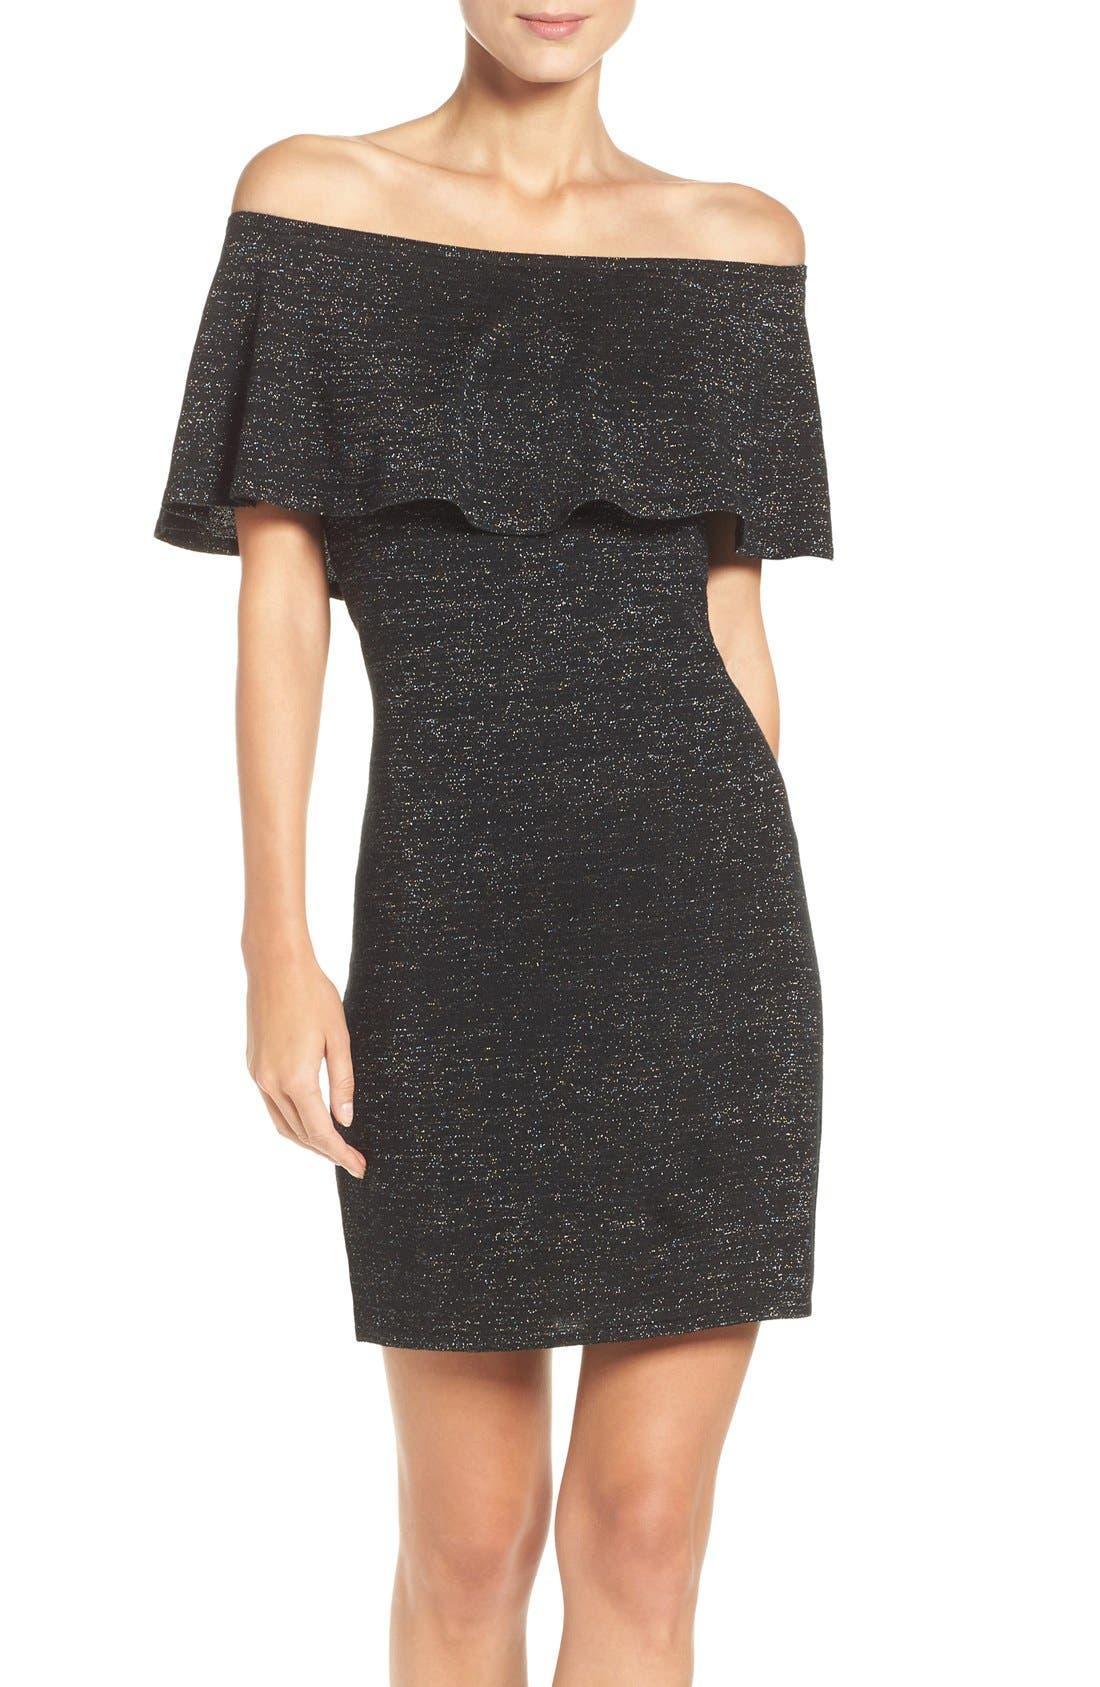 Alternate Image 1 Selected - trina Trina Turk Off the Shoulder Dress